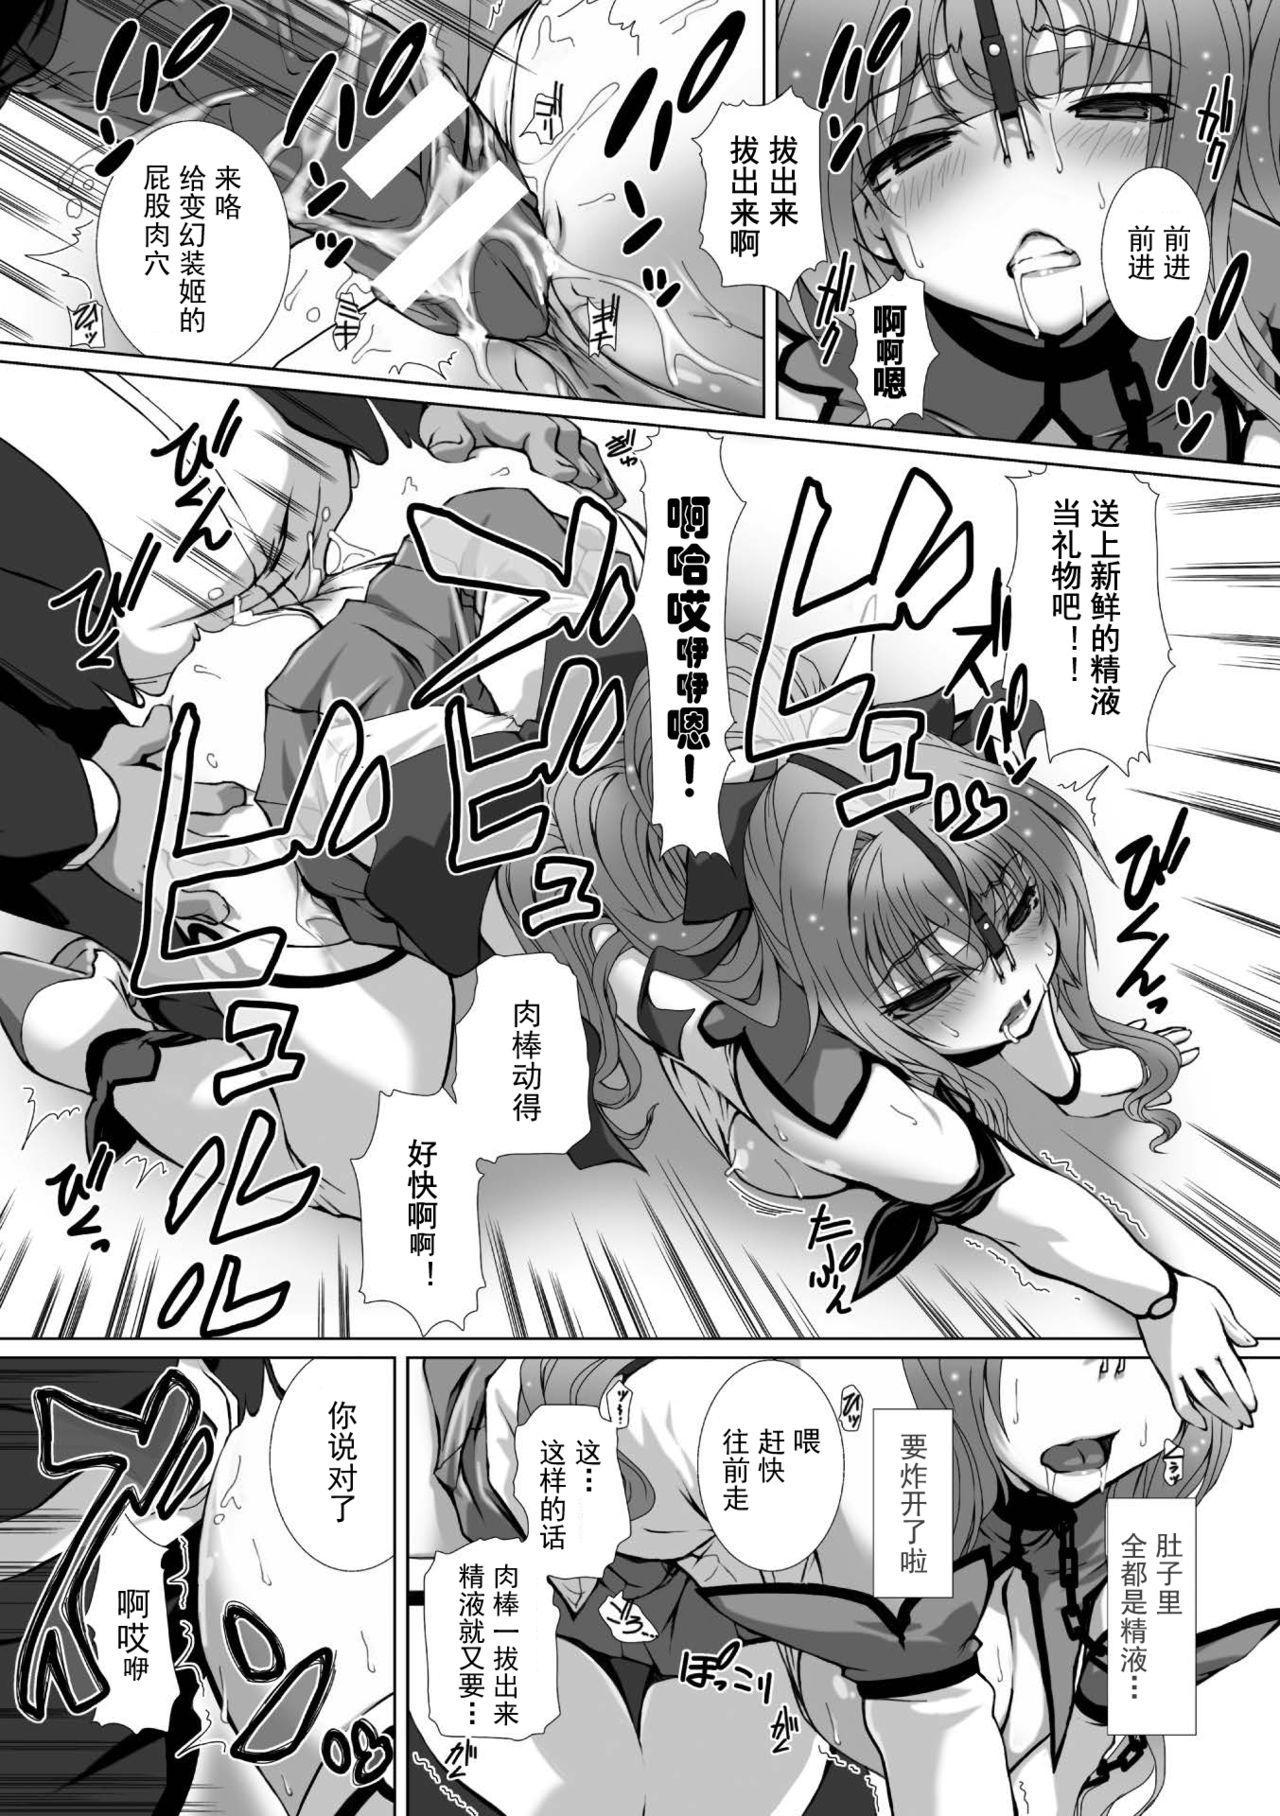 Hengen Souki Shine Mirage THE COMIC EPISODE 1-5 65